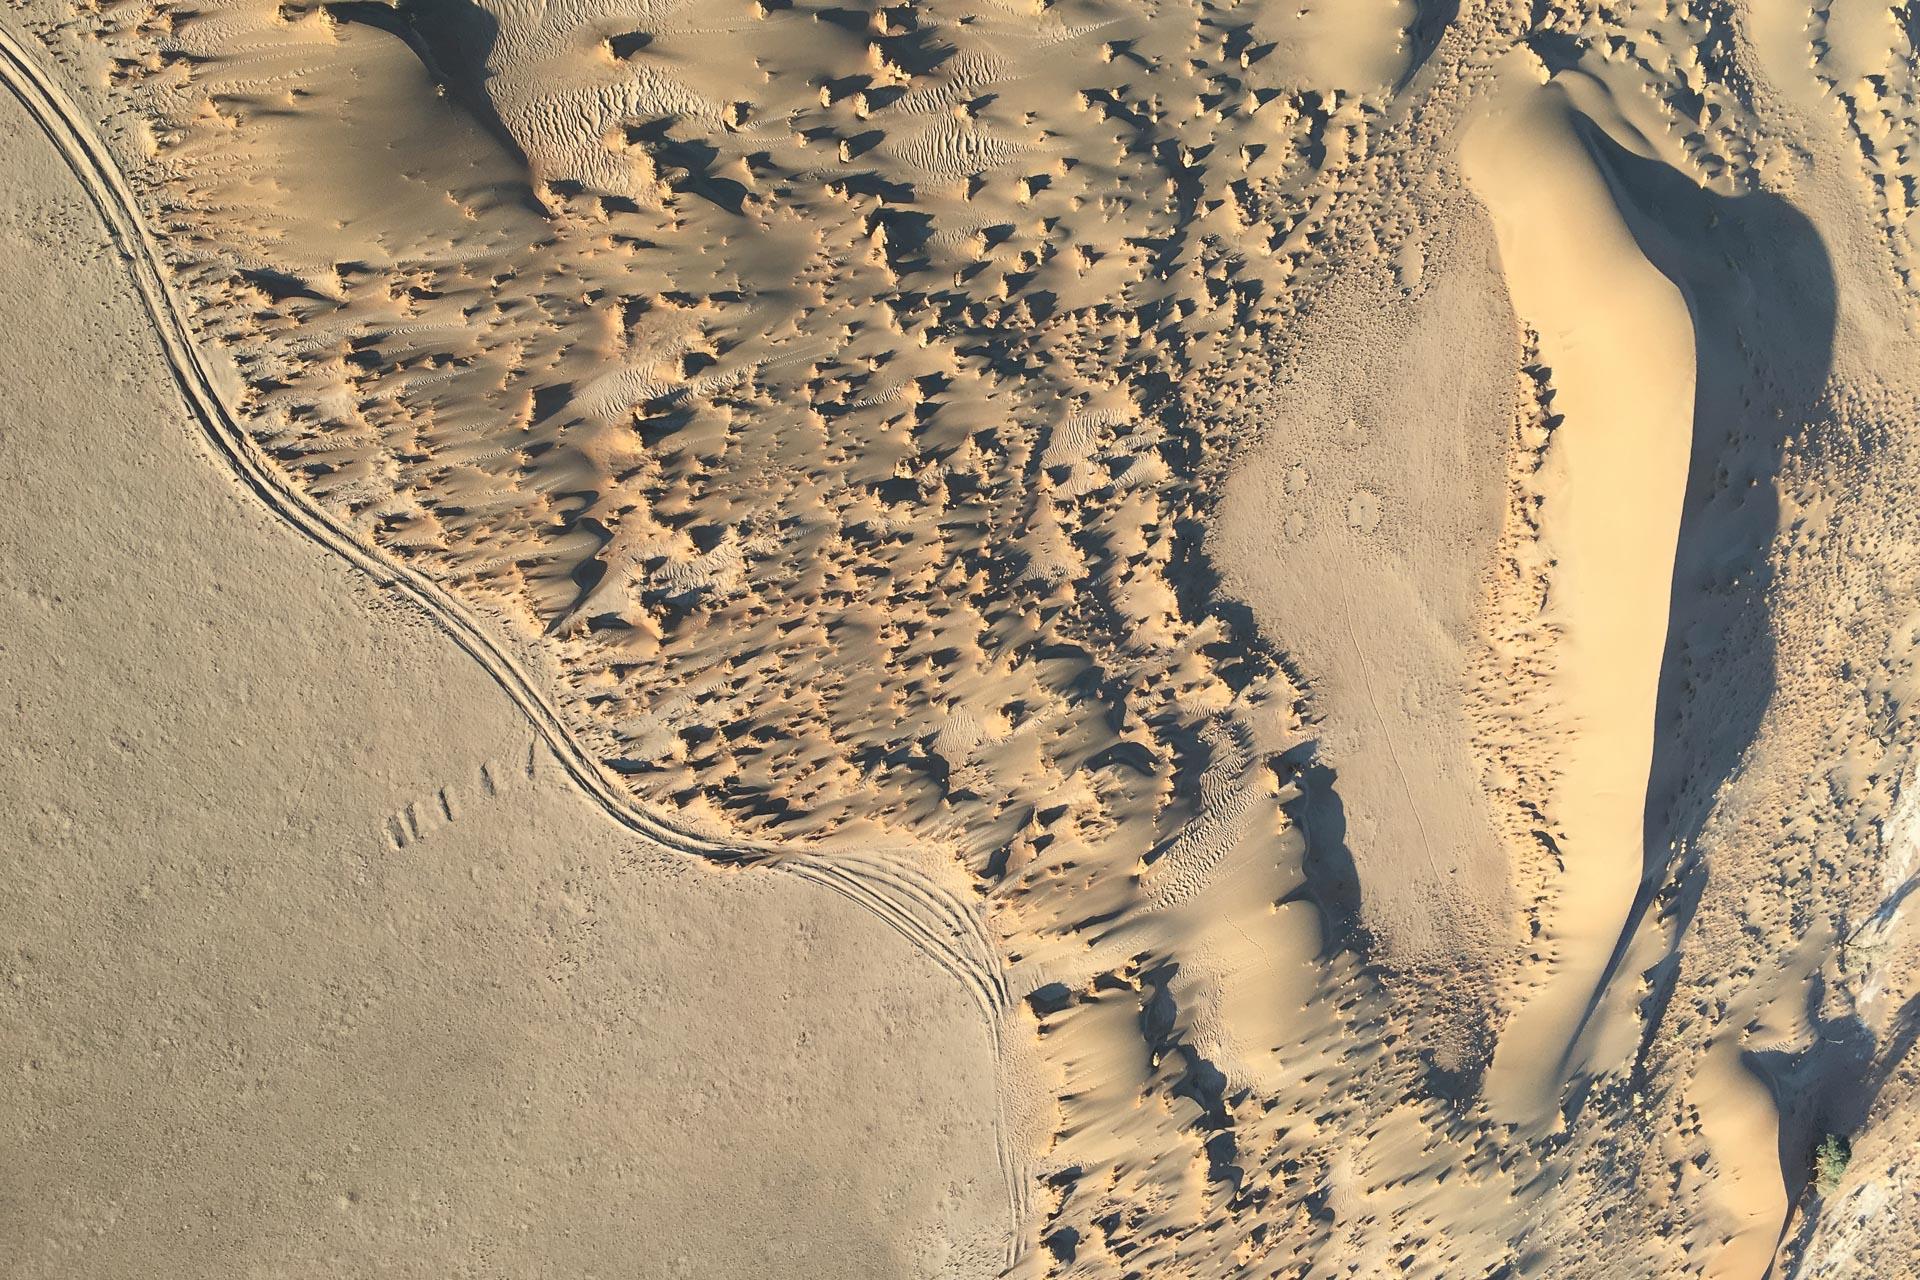 Namib-Ballonfahrt-Wueste-Namibia-Globetrotter-Select-6